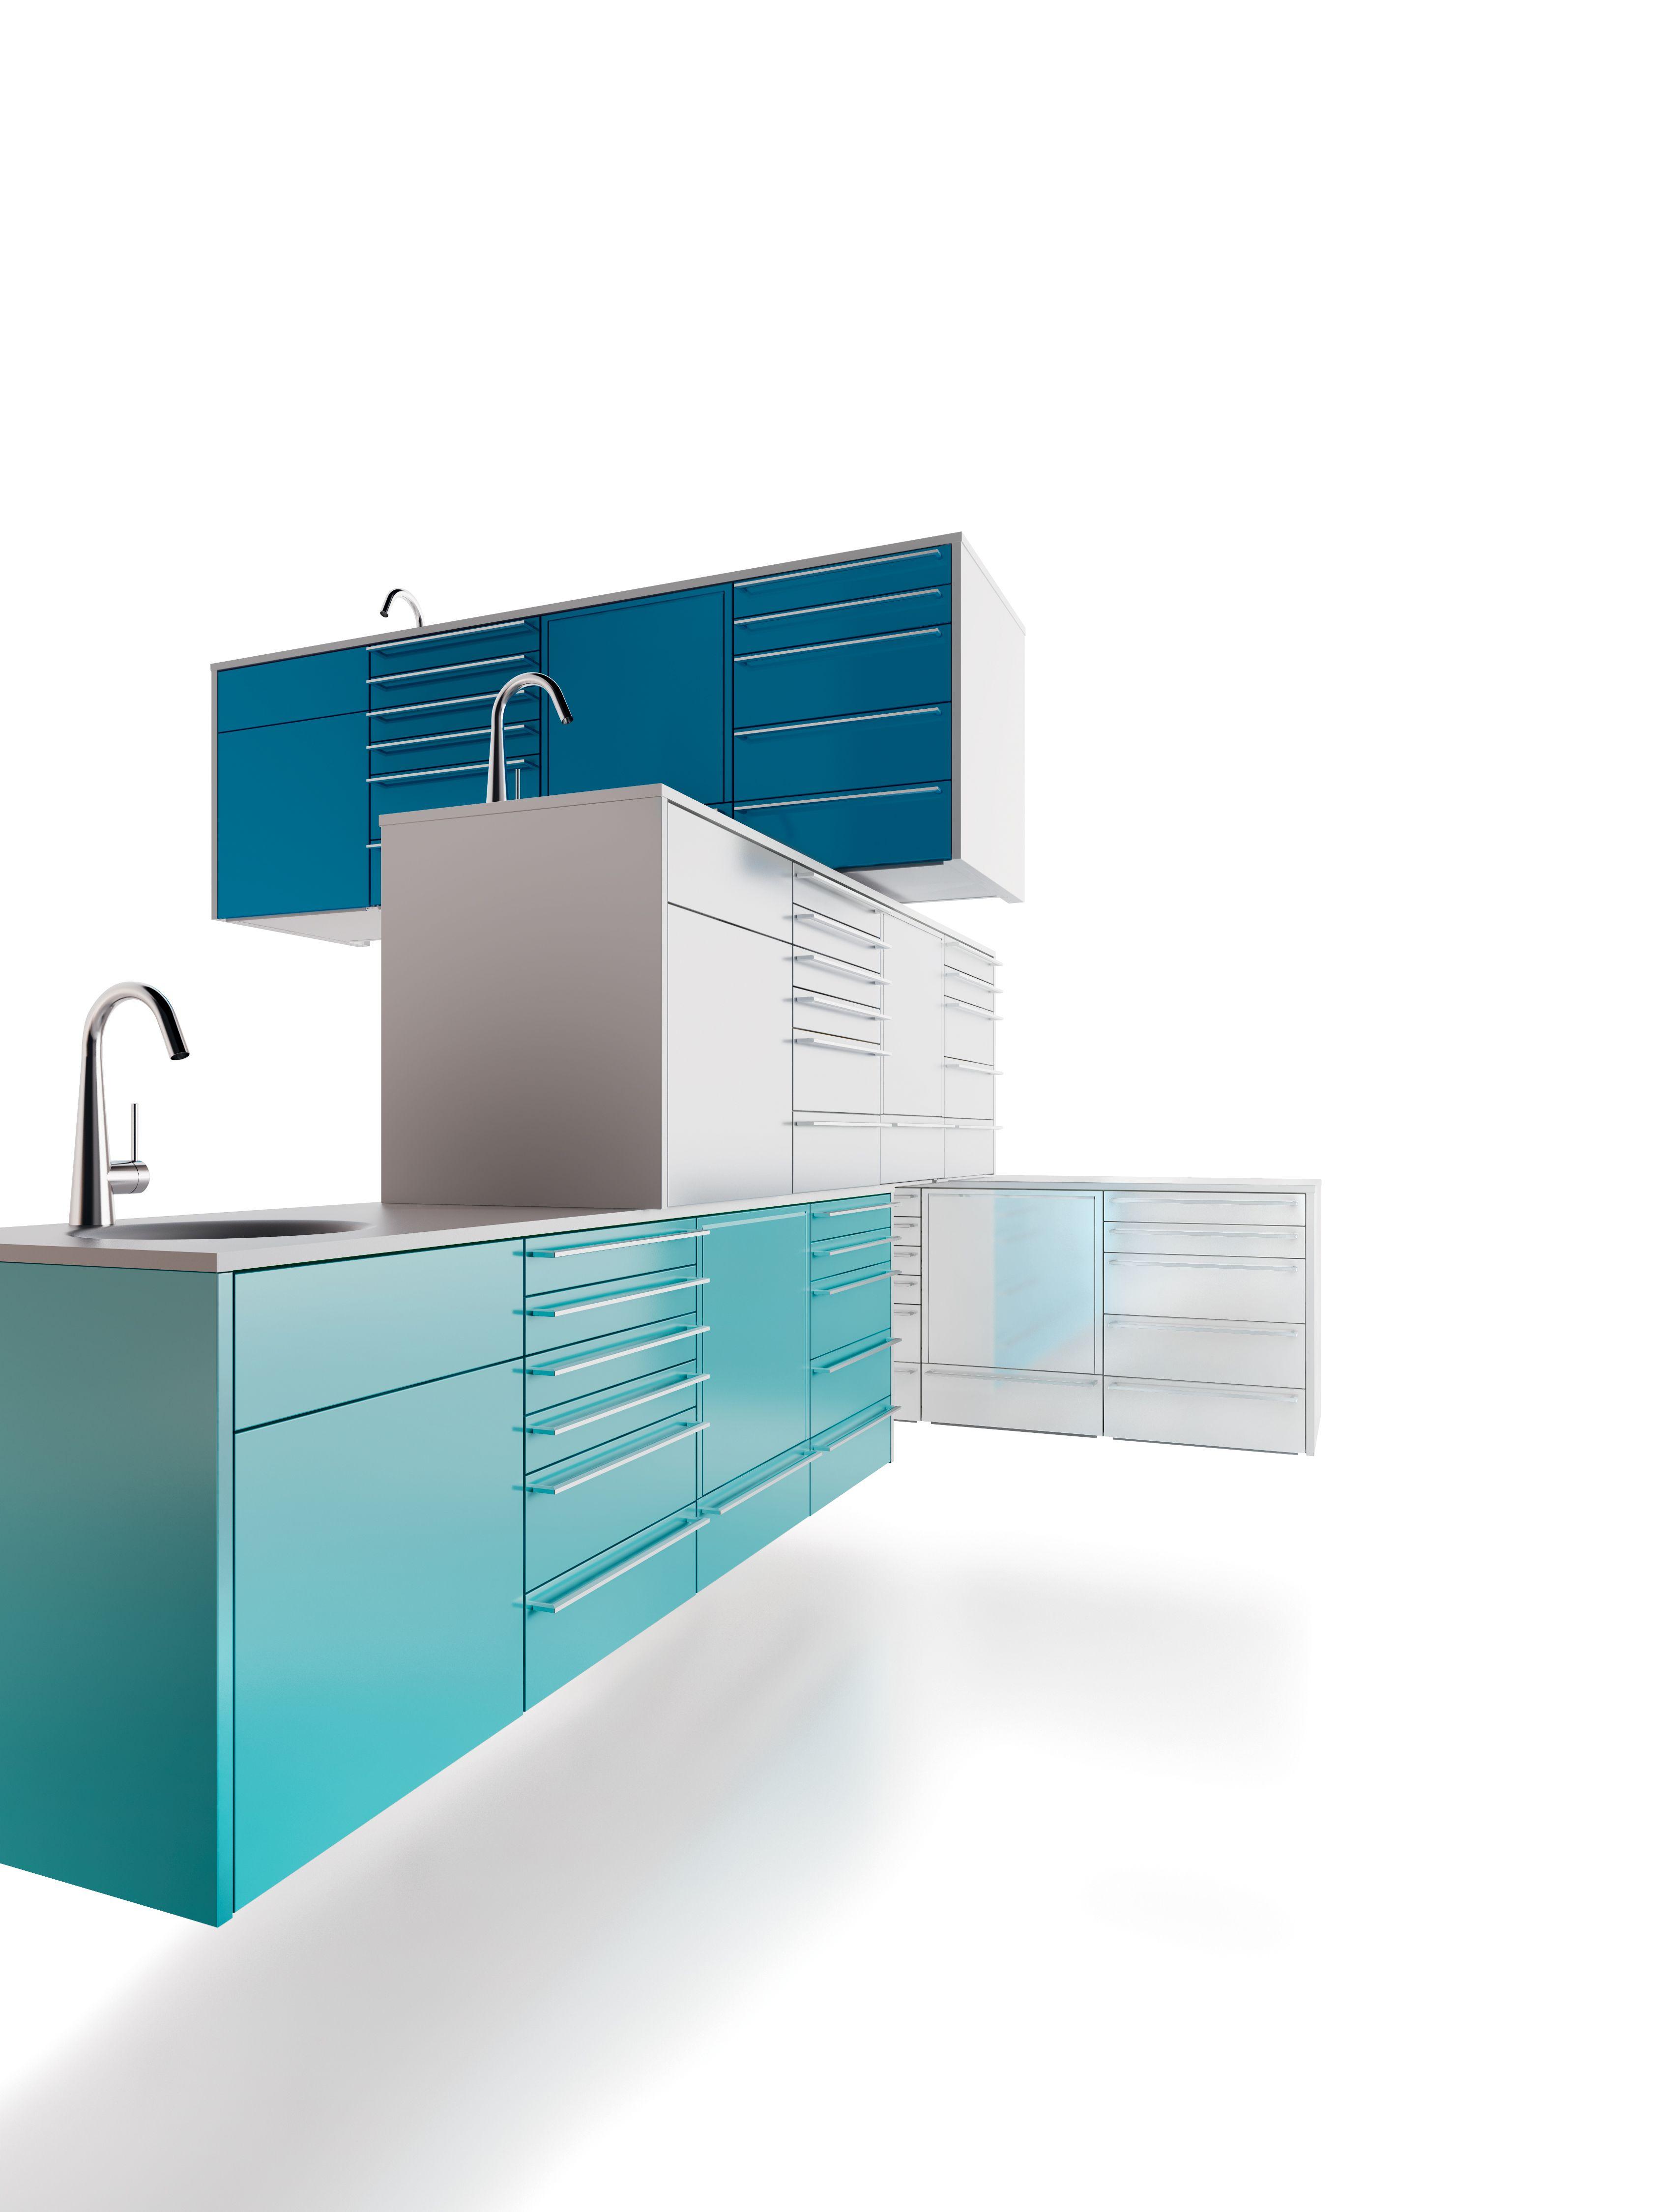 dentaloffice #dentalartitalyepta | Clinic design | Pinterest ...